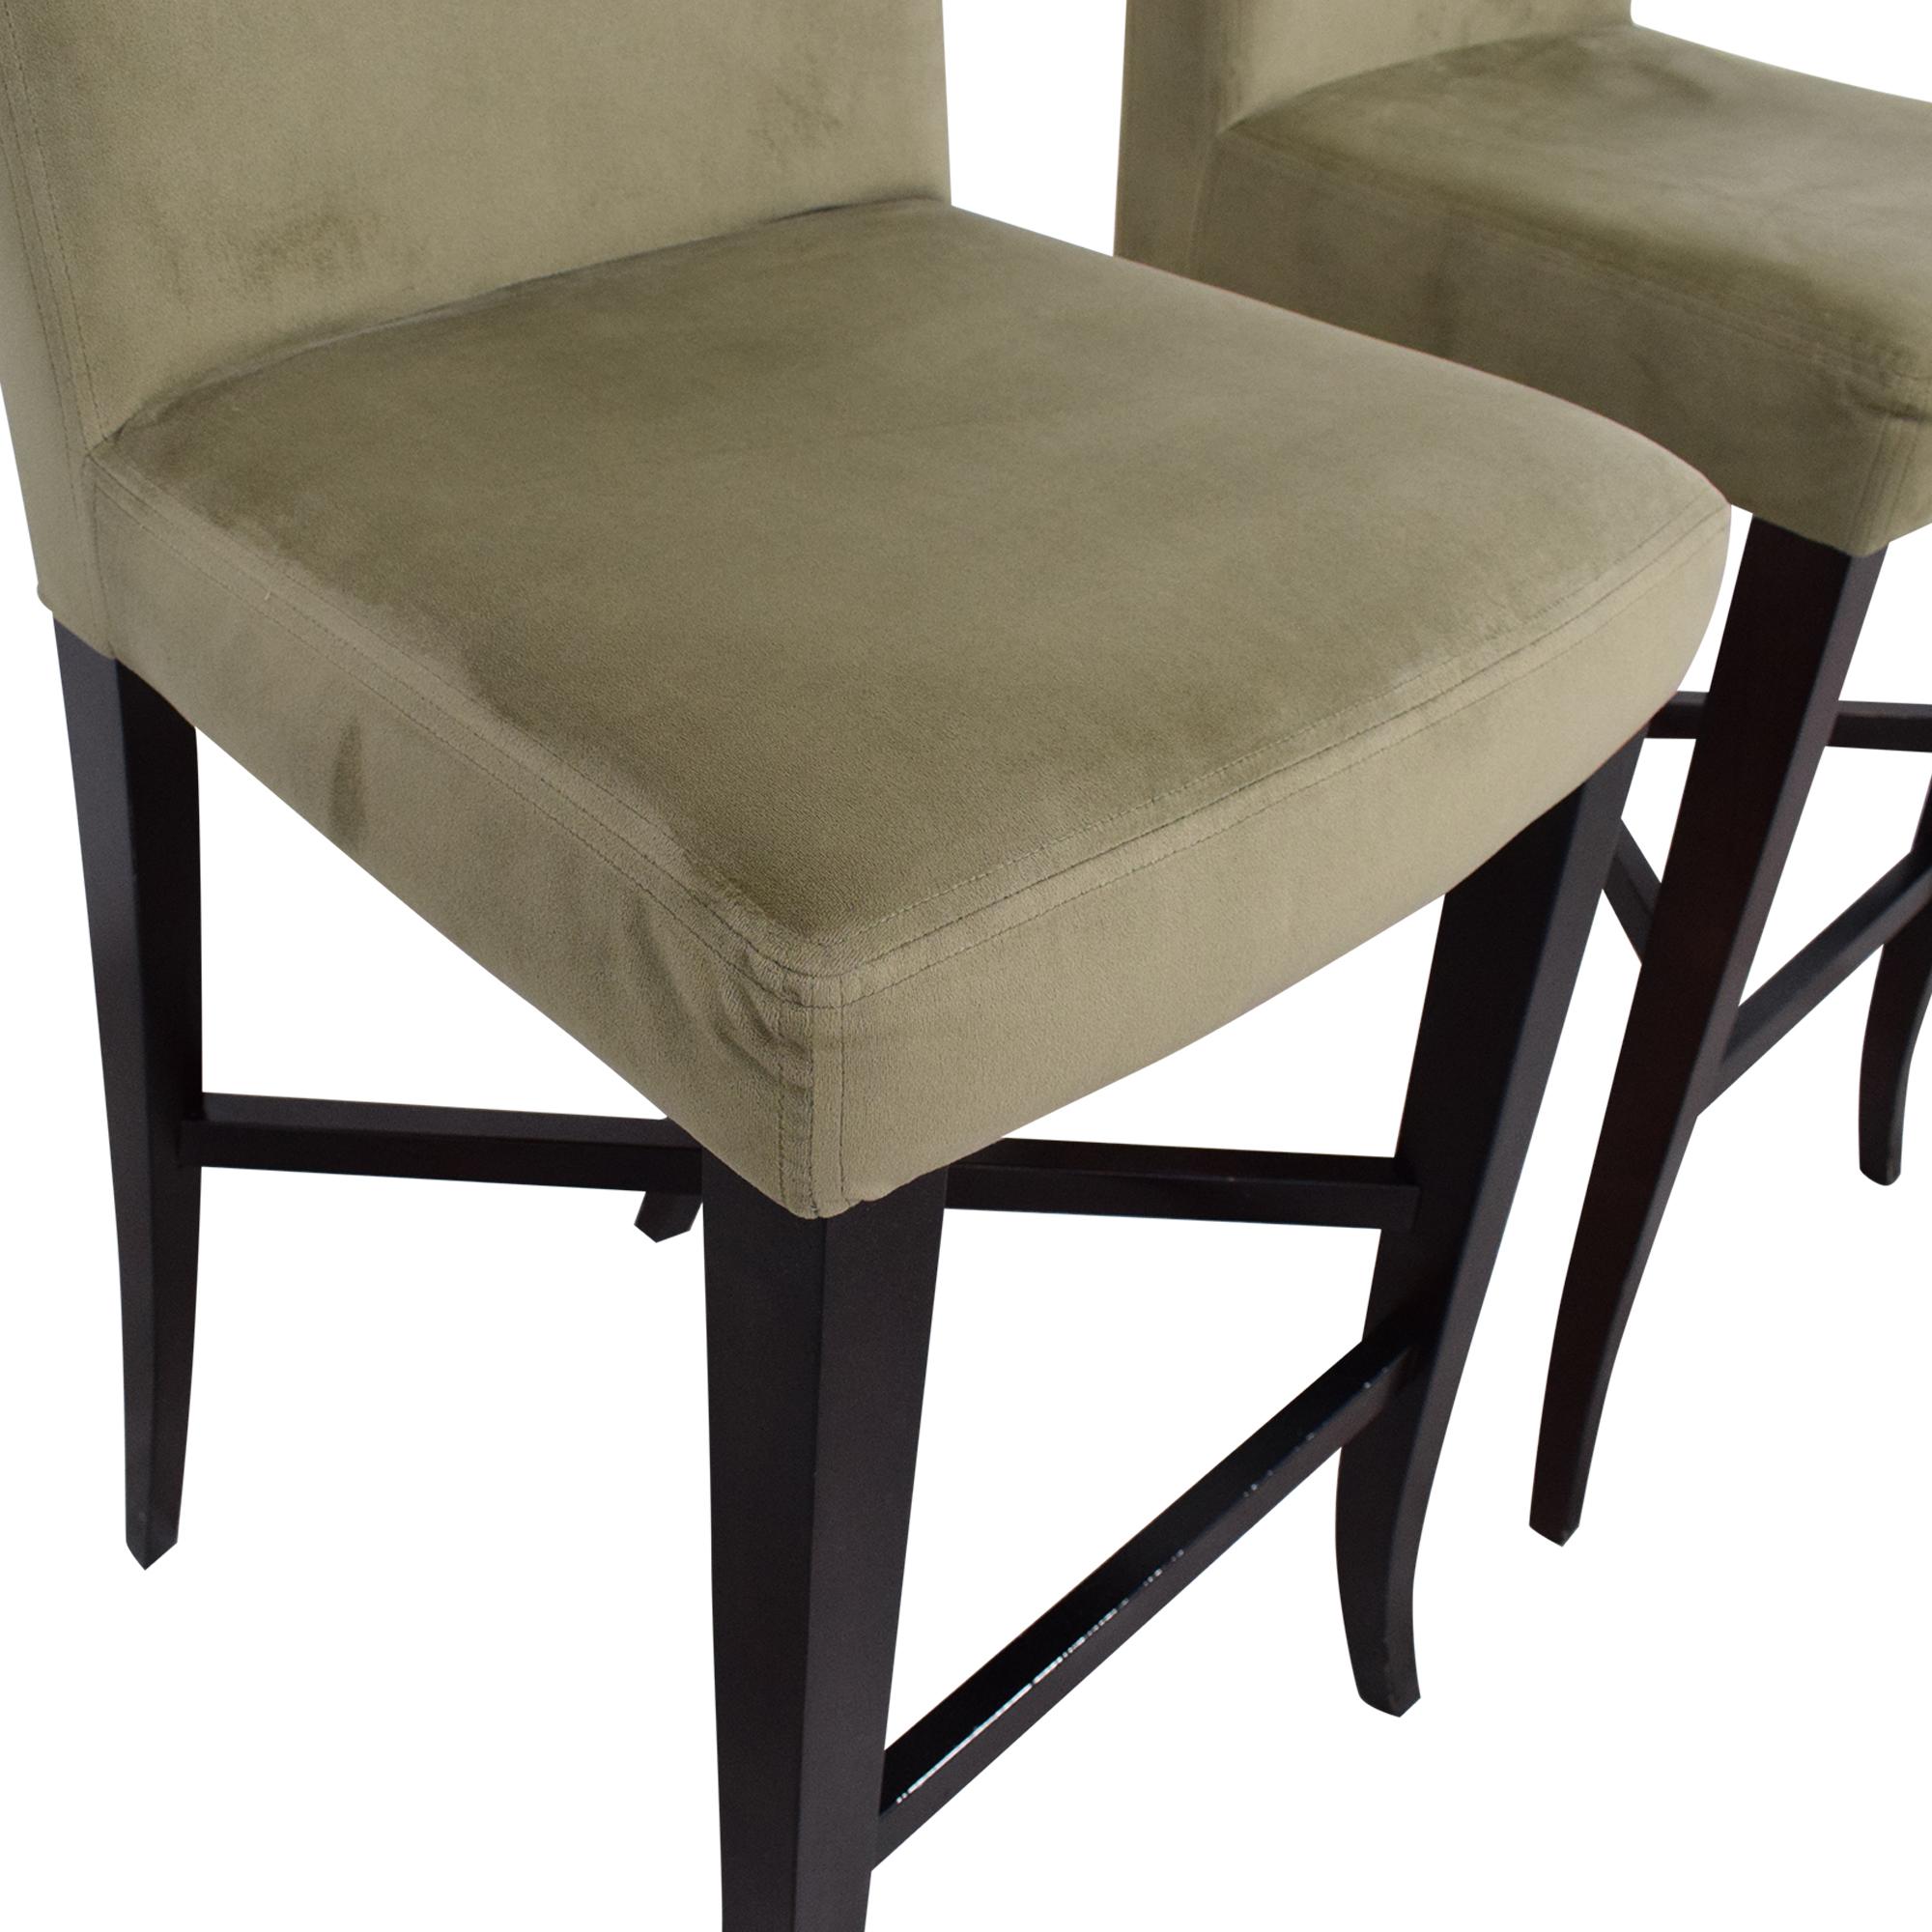 shop Crate & Barrel Crate & Barrel Upholstered Bar Stools online